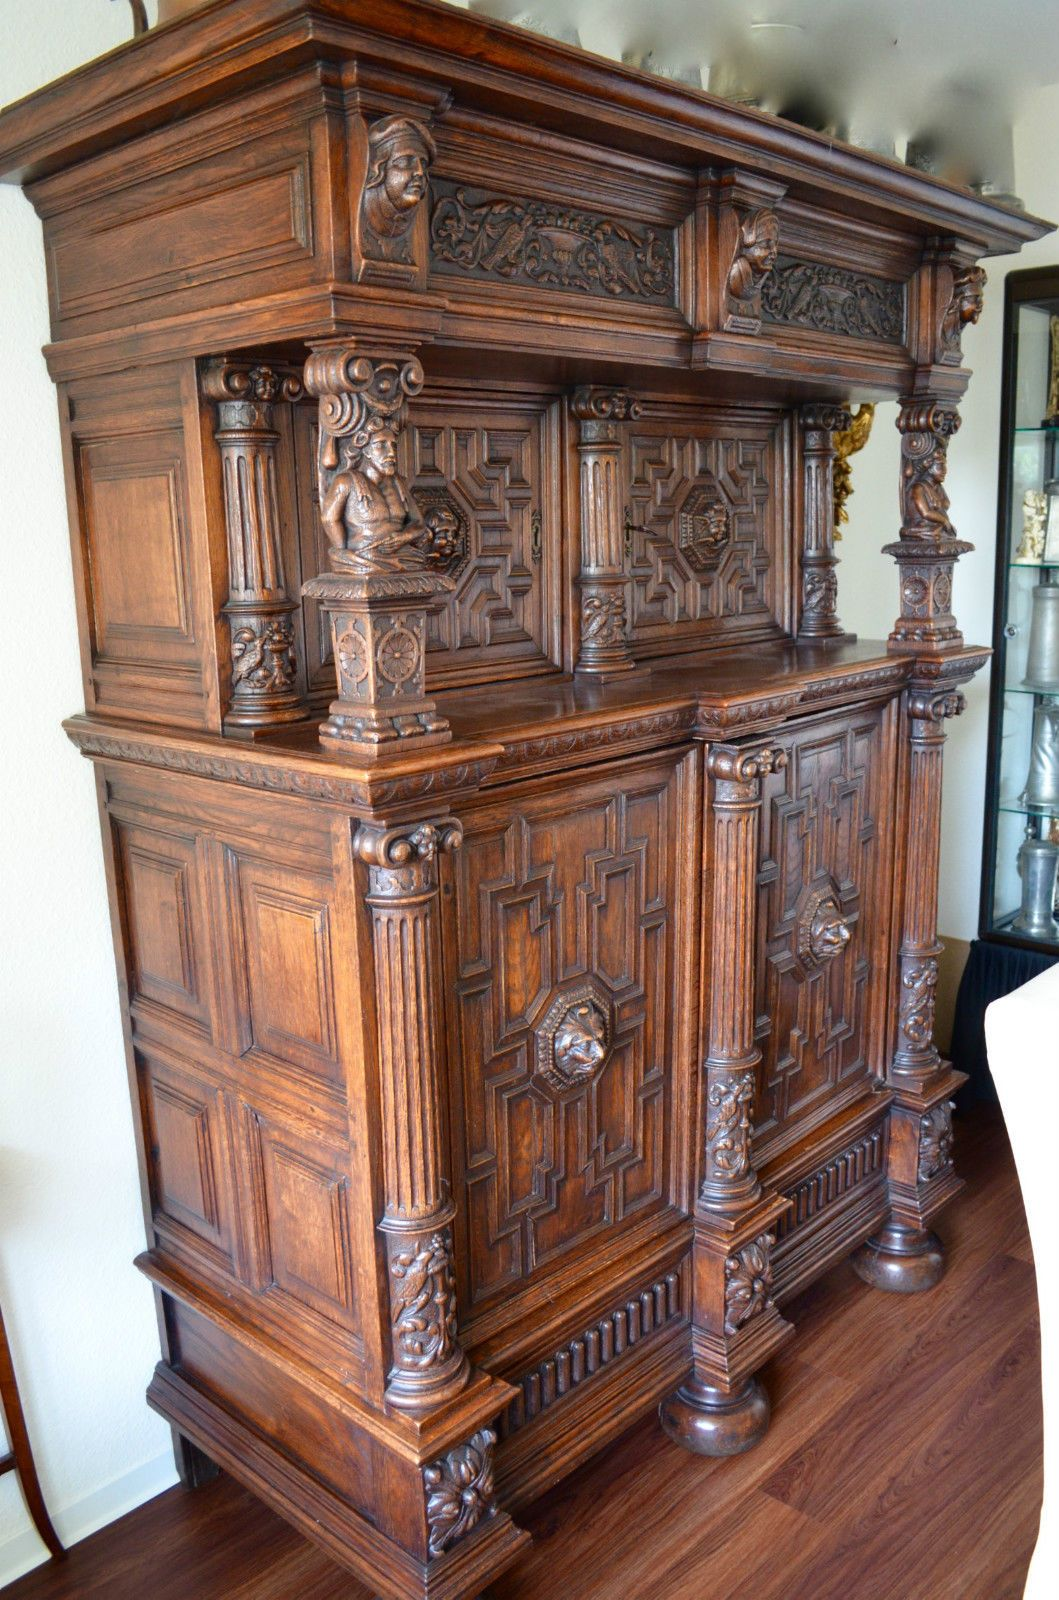 renaissance berbauschrank k ln um 1630 reich geschnitzt originalzustand in antiquit ten. Black Bedroom Furniture Sets. Home Design Ideas